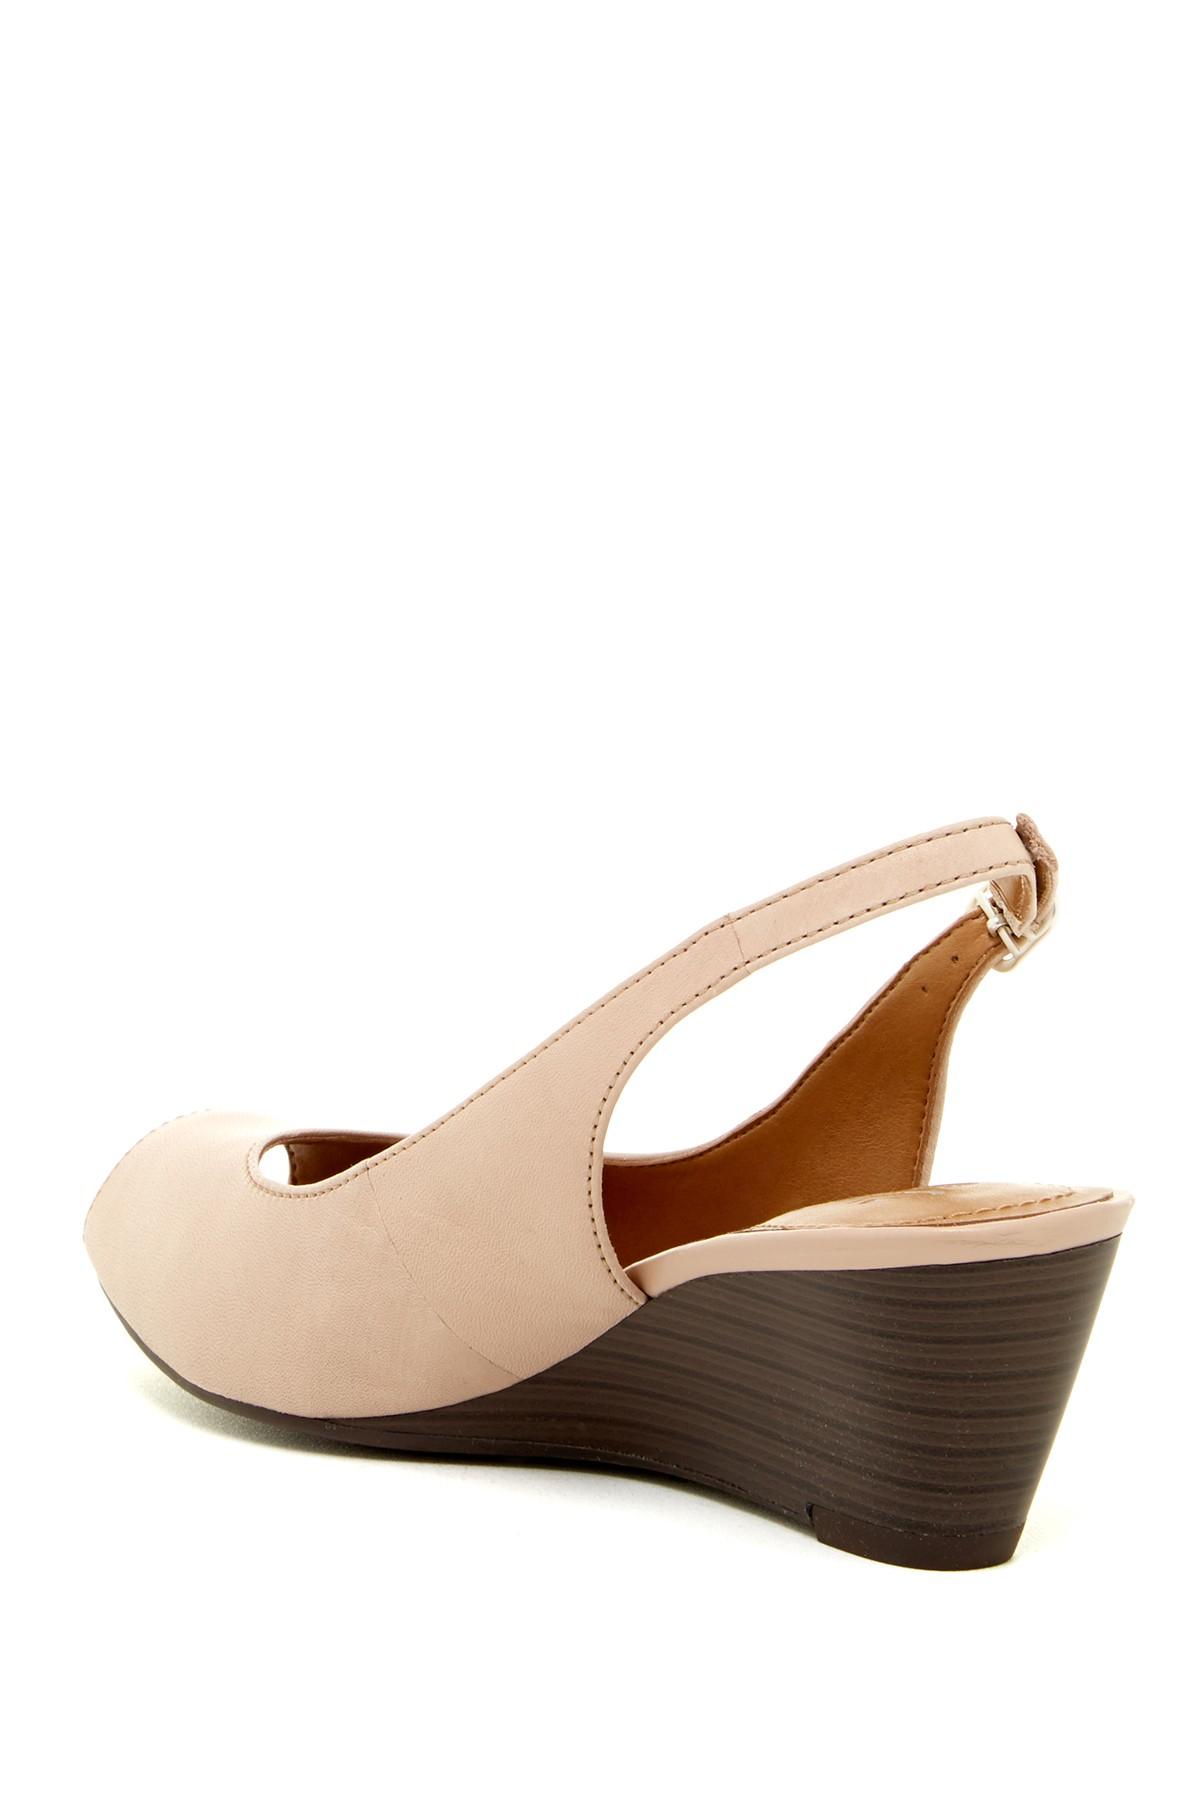 Clarks Shoes Women Pump Nordstrom Rack